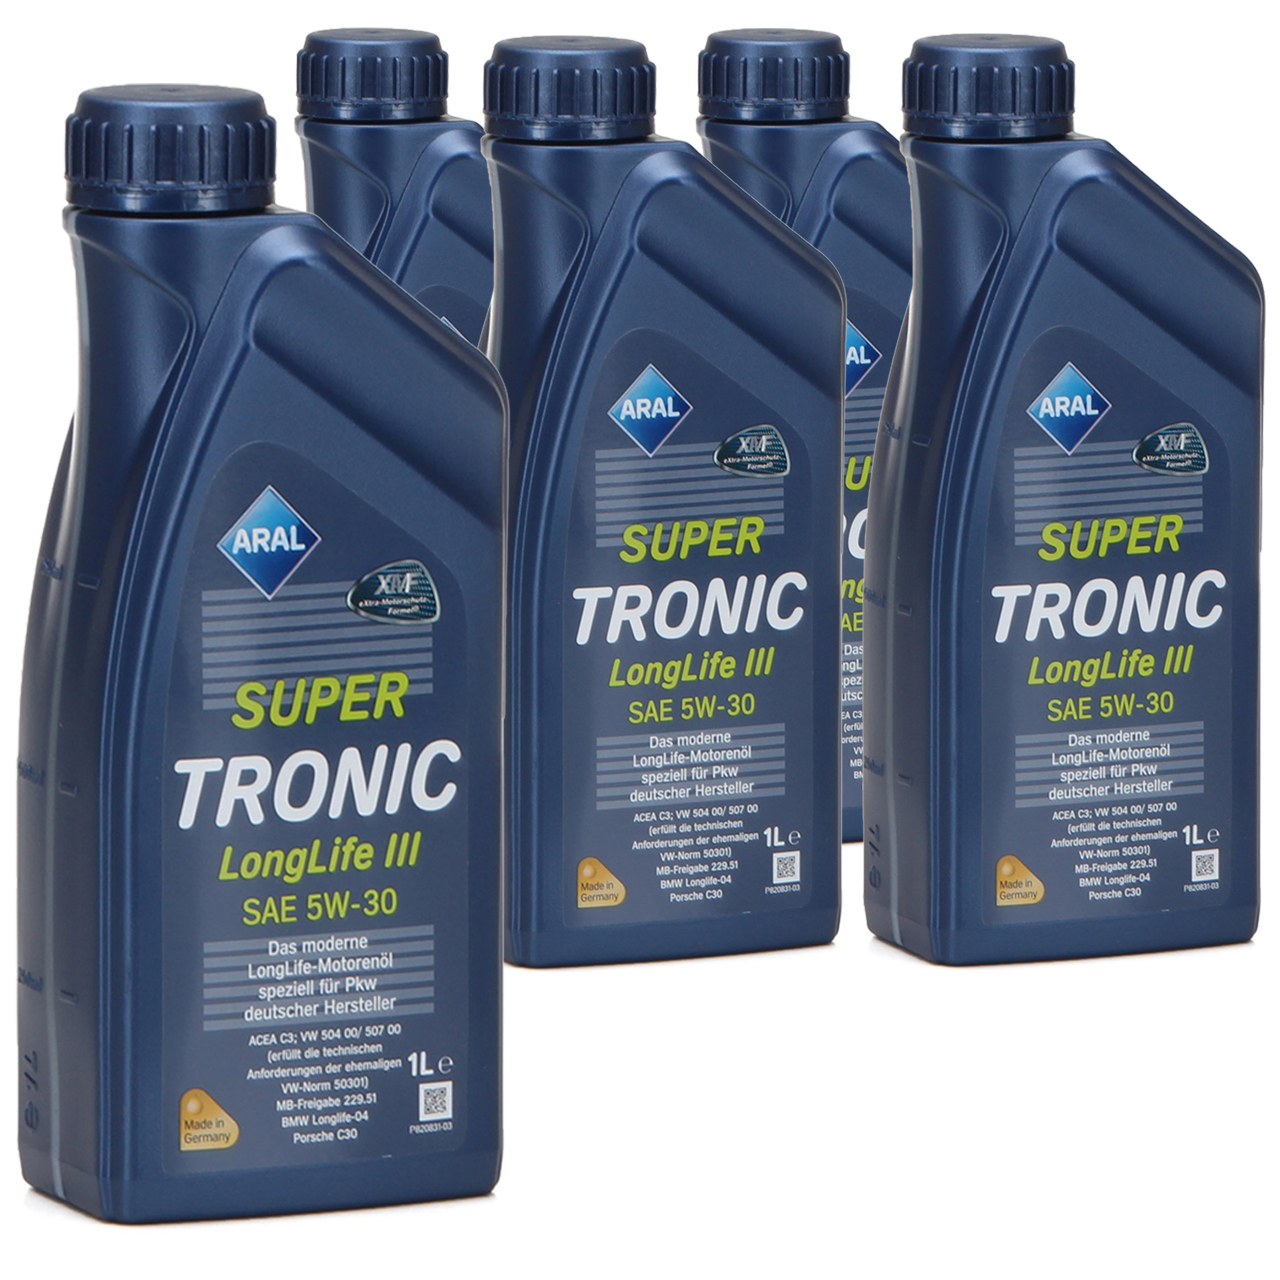 ARAL Motoröl Öl SUPER TRONIC LongLife III 5W30 für VW 504.00/507.00 - 5 Liter